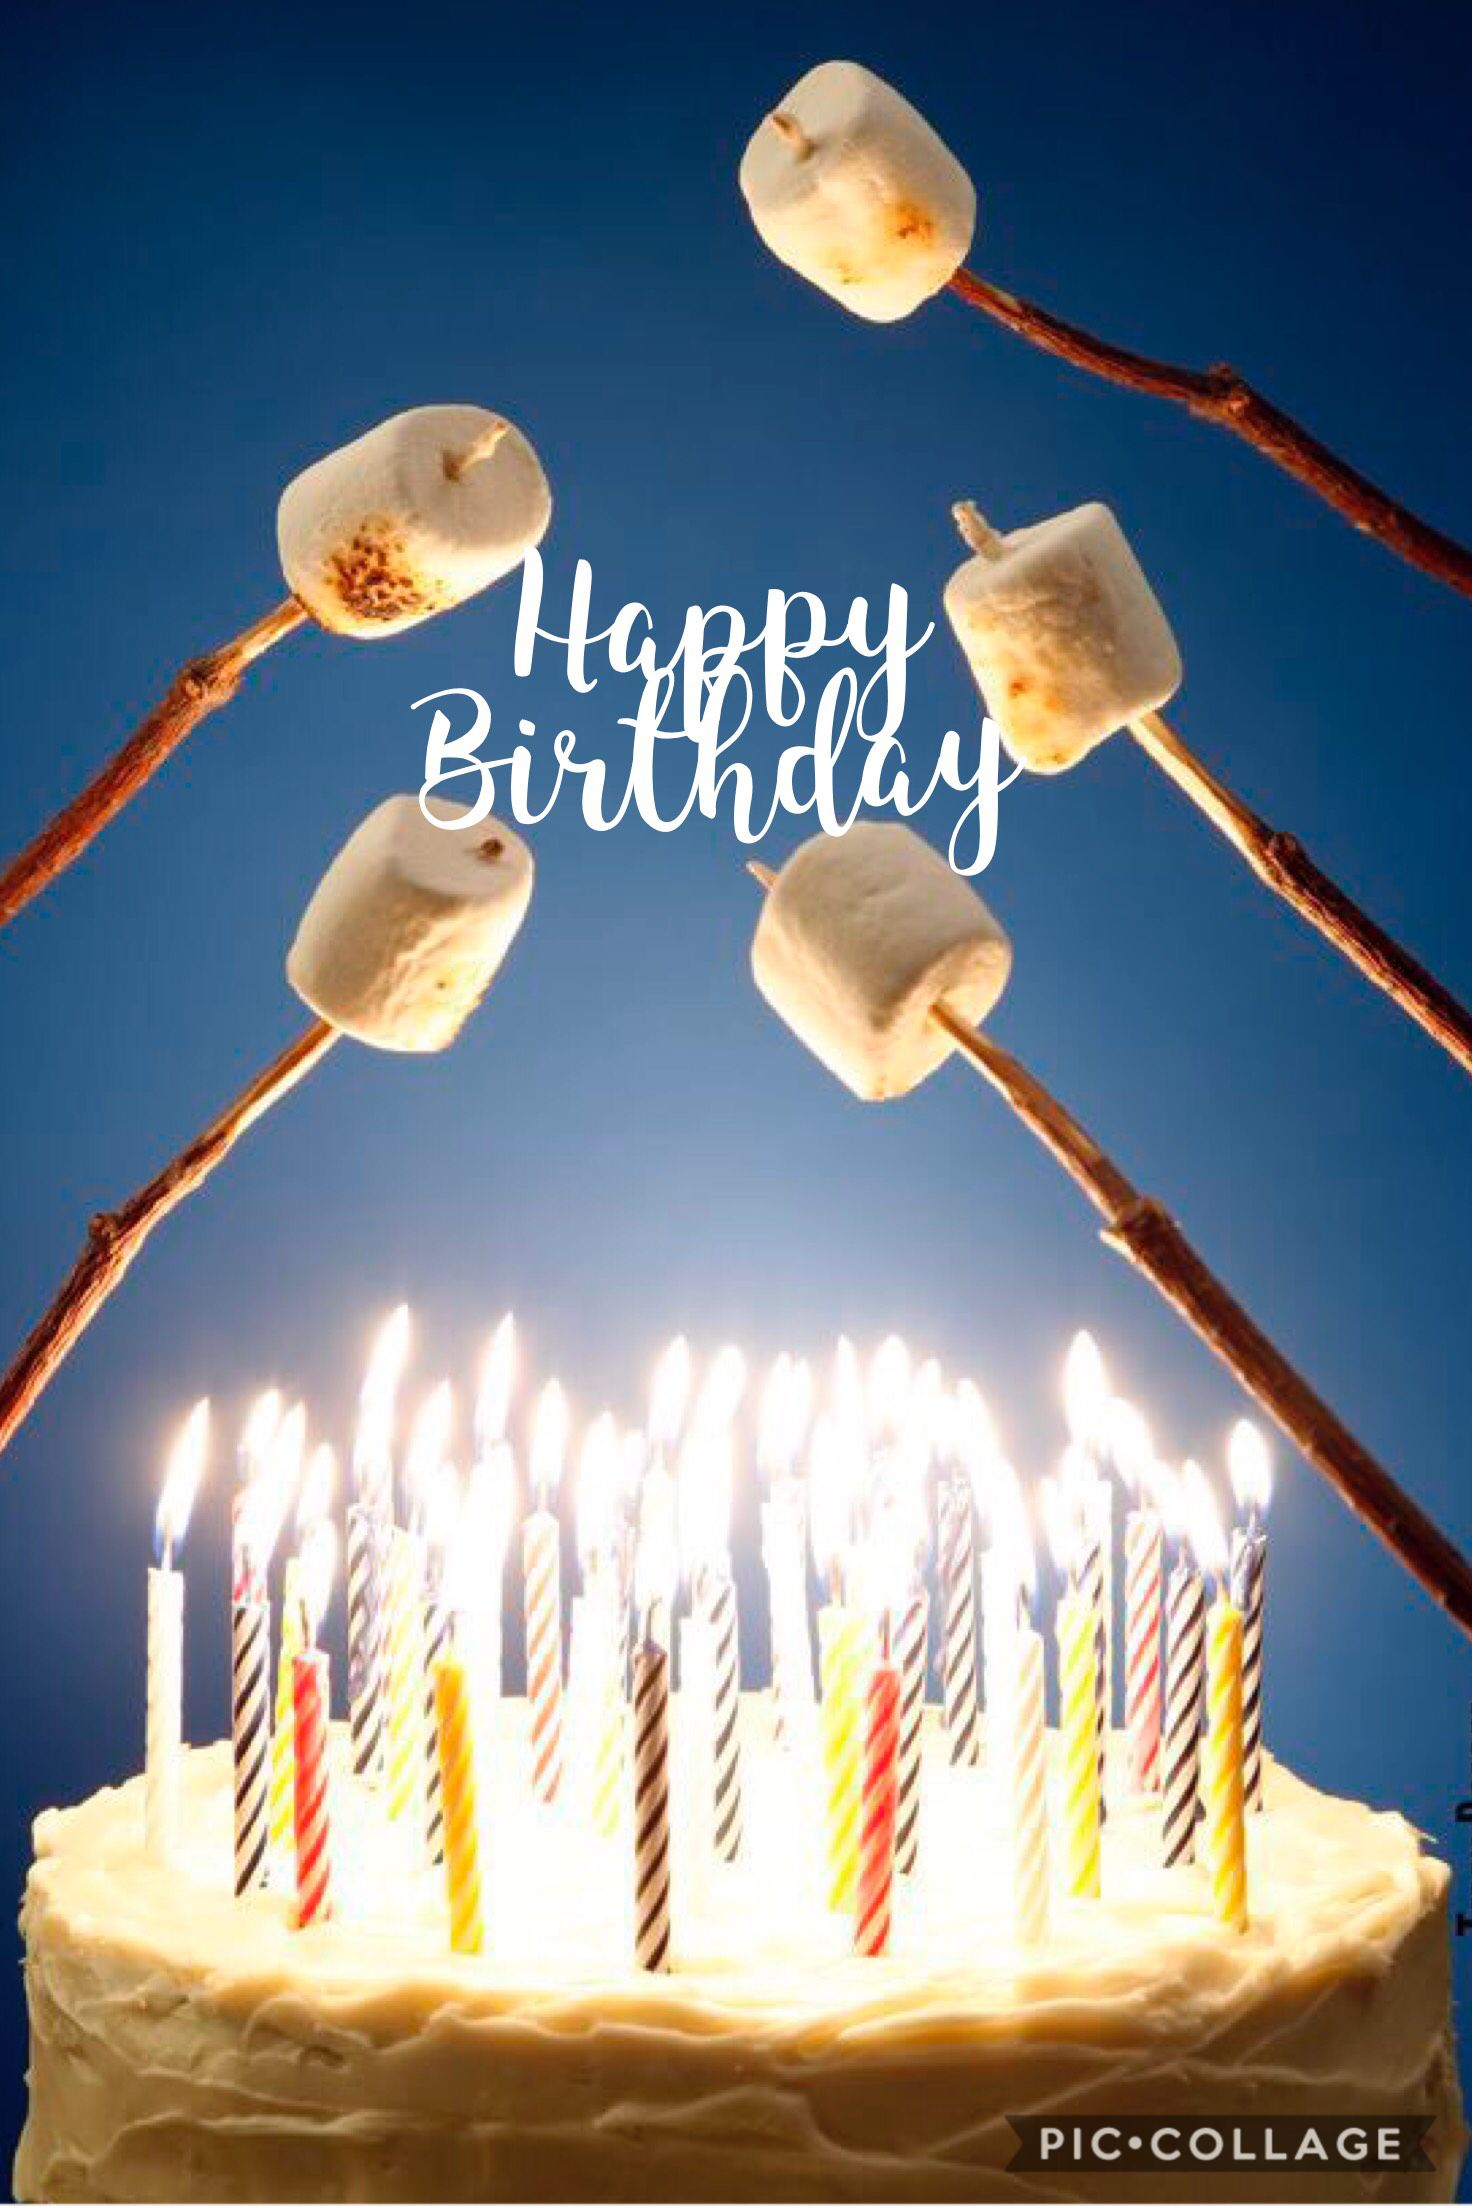 Epingle Par Emmanuelle Denieul Francillard Sur Birthday Pinterest